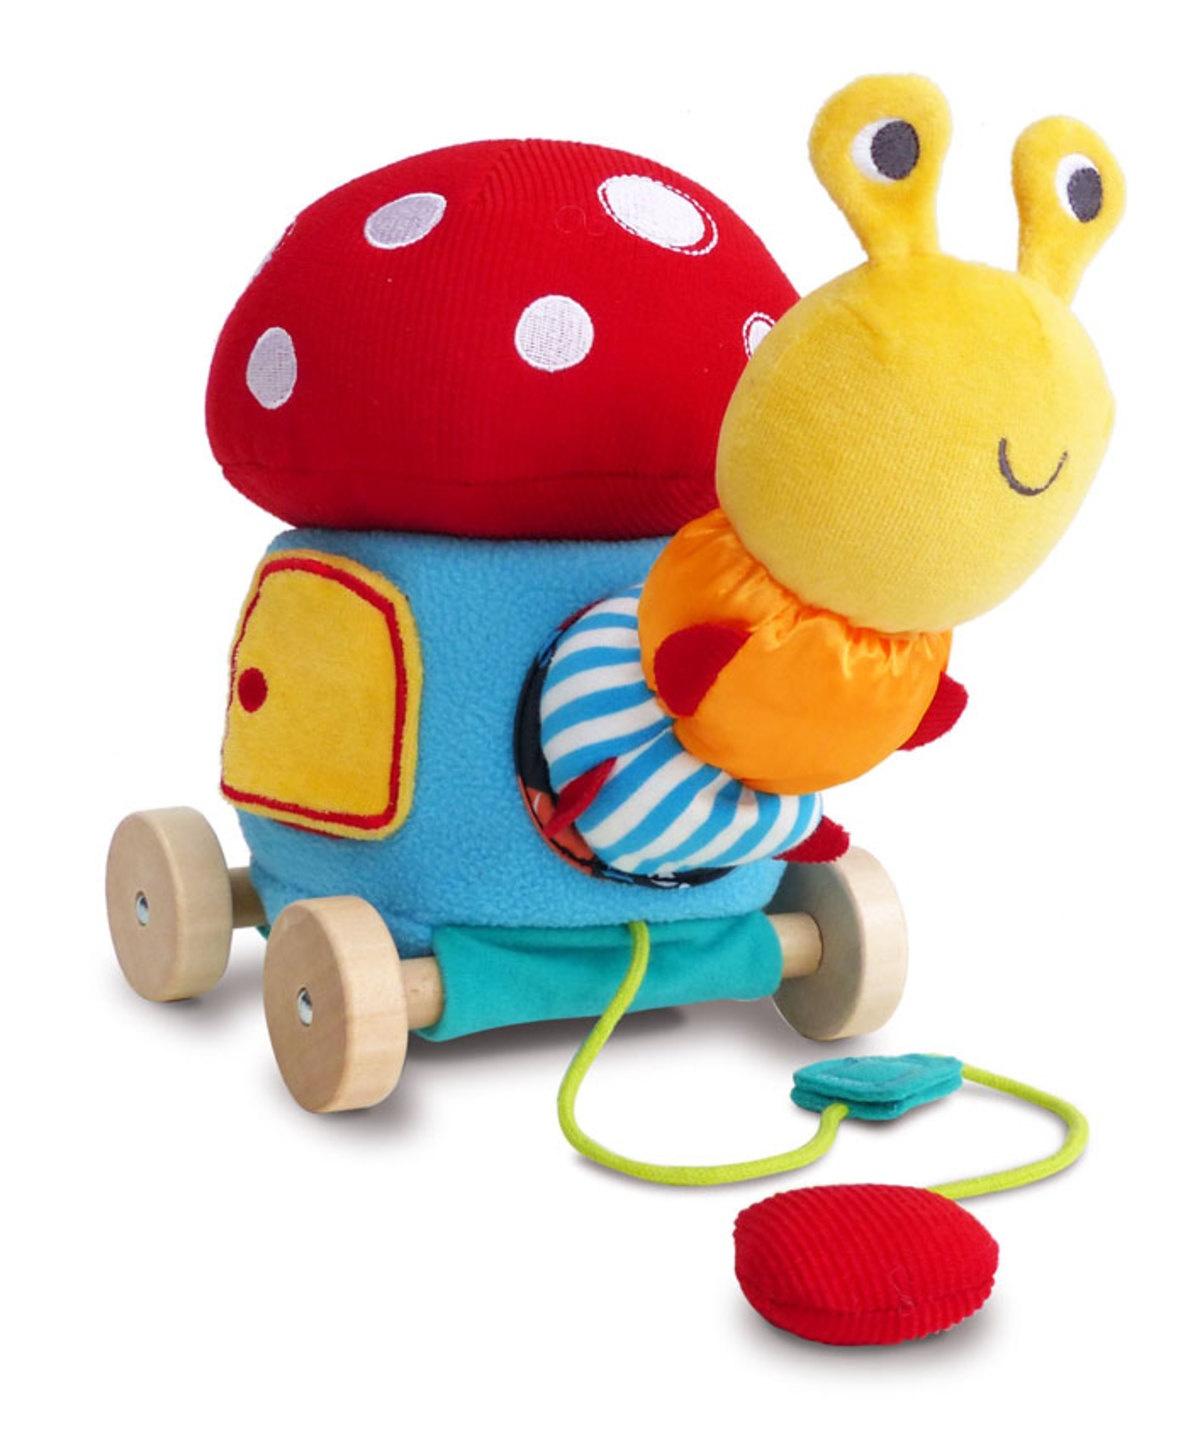 Игрушка-каталка Little Bird Told Me Развивающая игрушка красный little bird told me развивающий коврик щенок